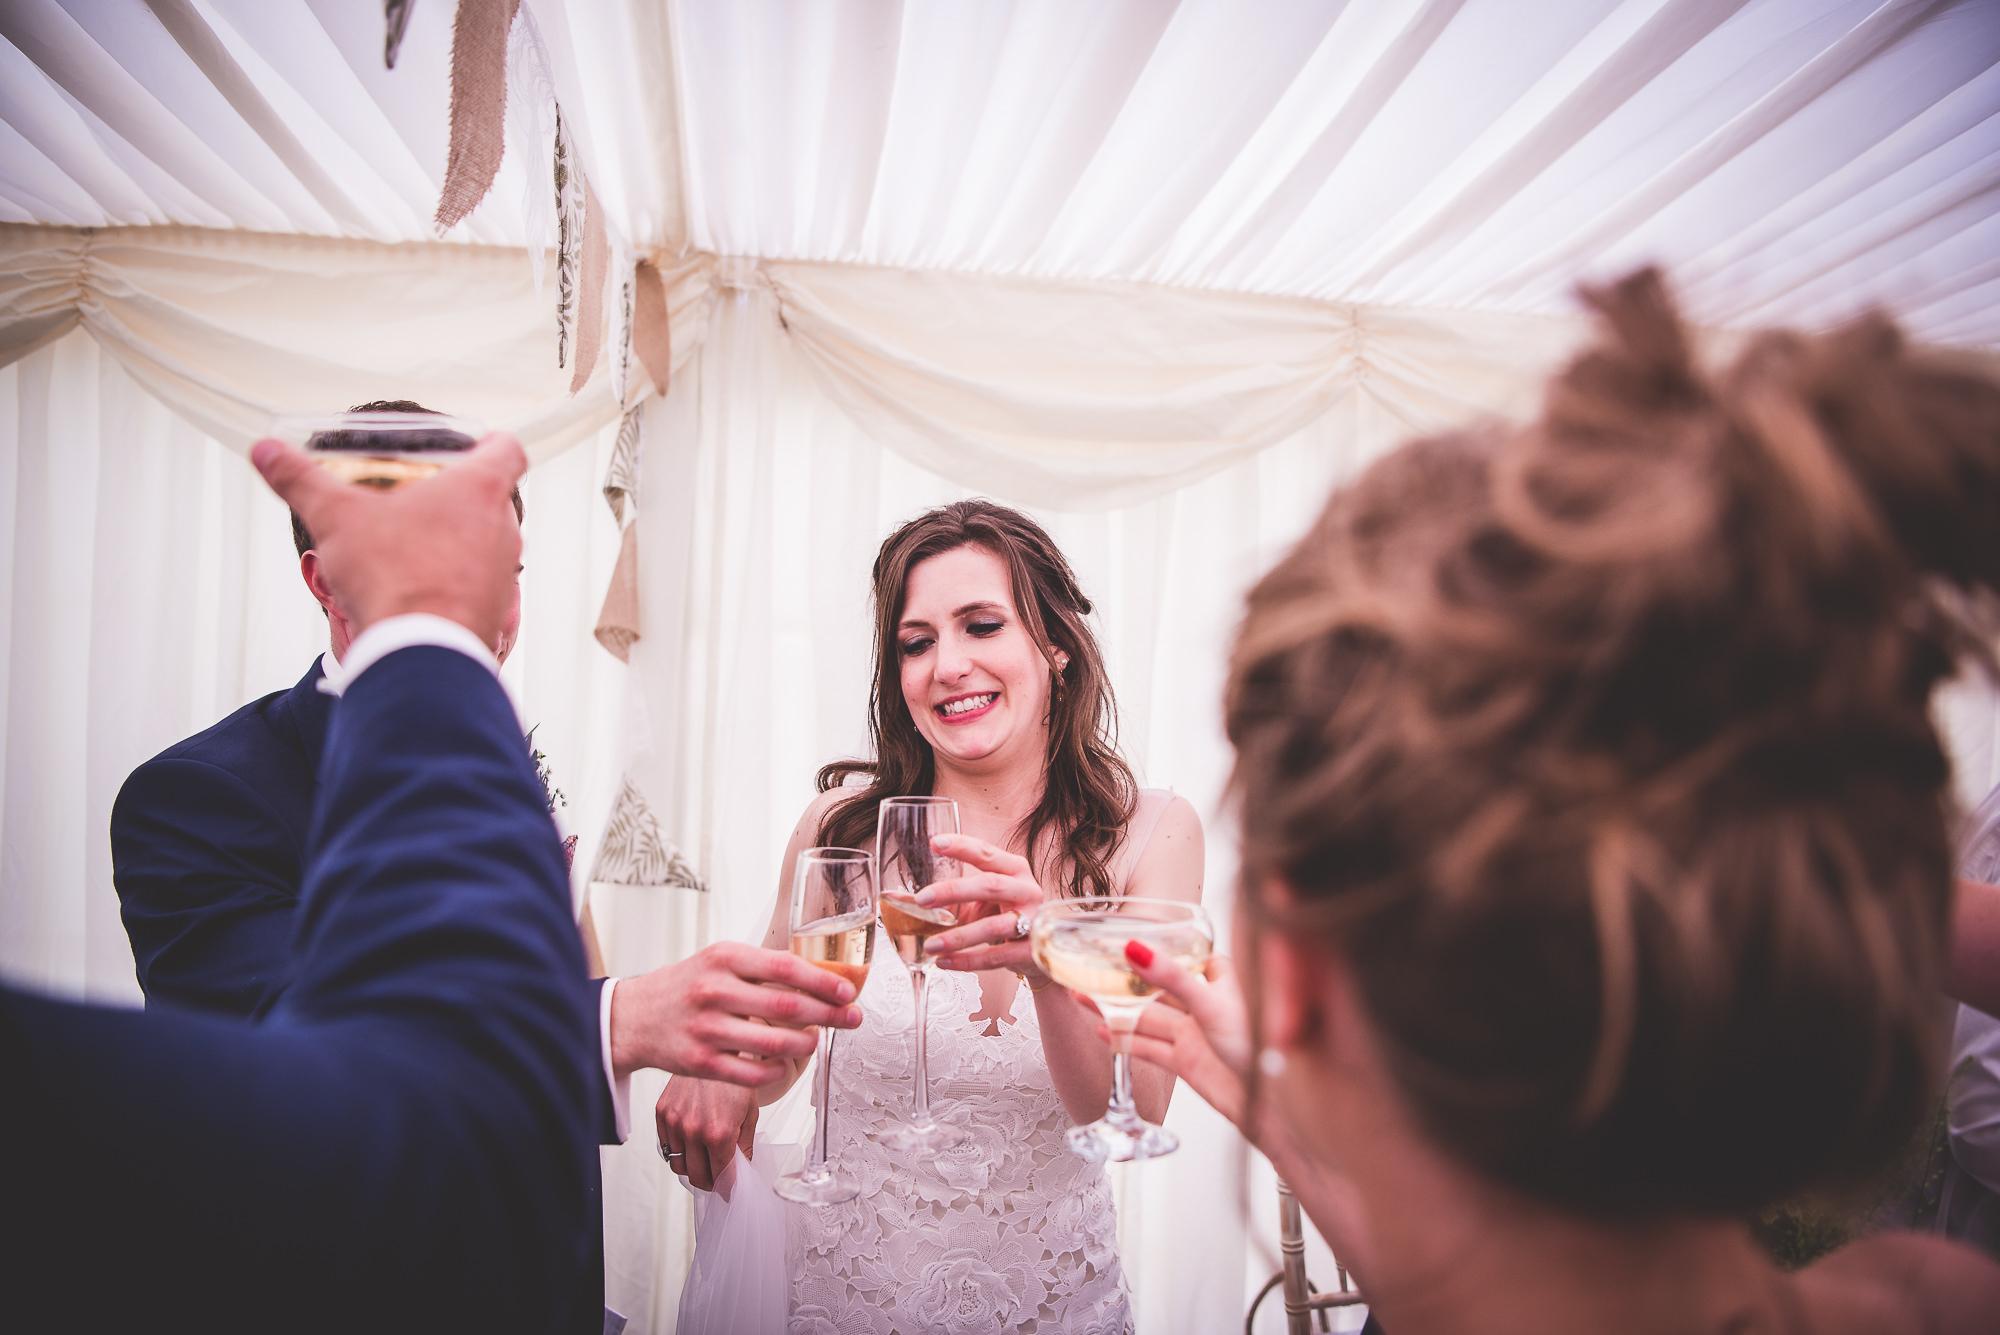 Veils & Bales Wedding Photography | Charlie & Steve SCSS 178